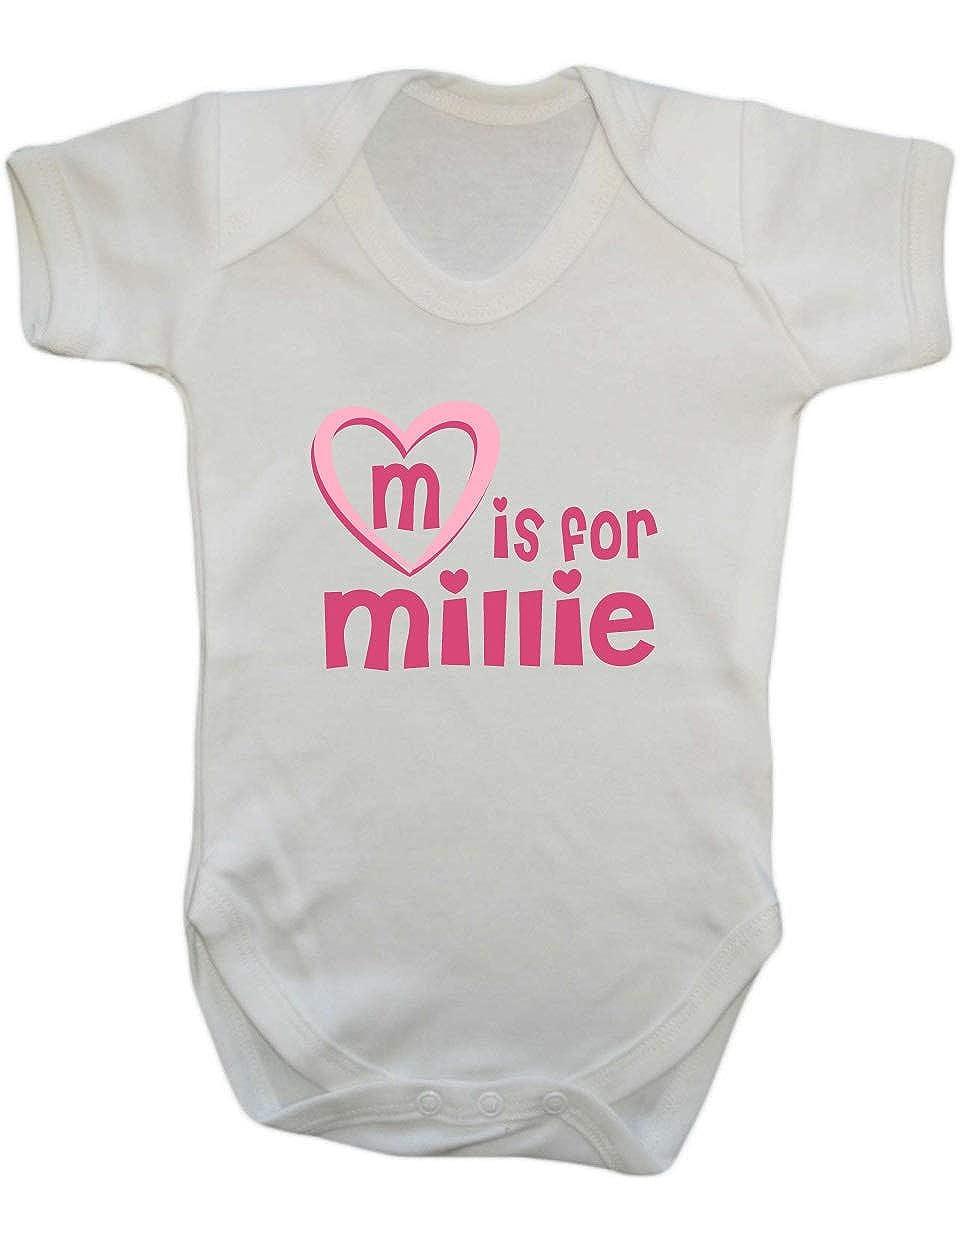 M is for Millie Baby Vest Millie baby gift Millie newborn baby Vest